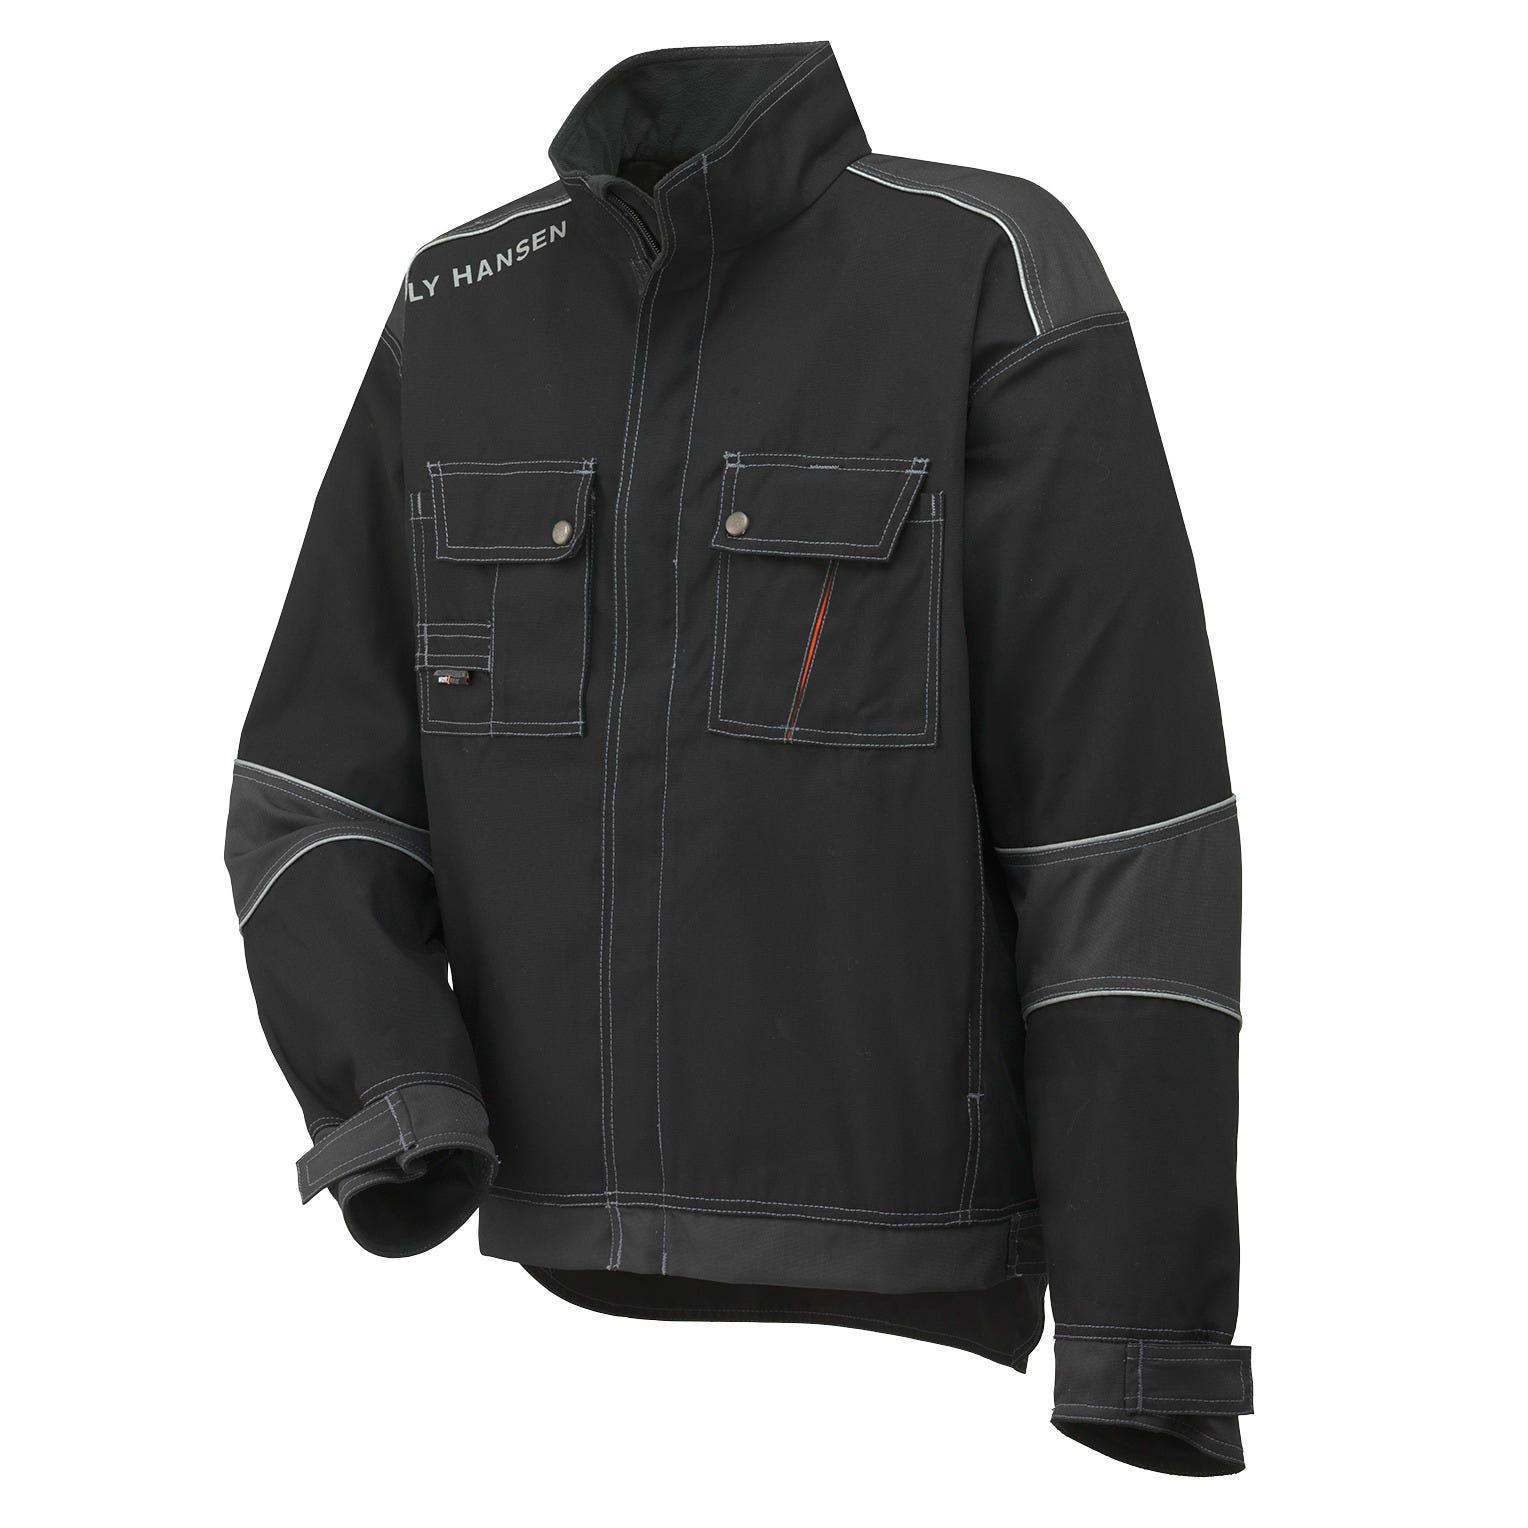 HH Workwear Workwear Chelsea Reinforced Reflective Work Jacket Black XXXL